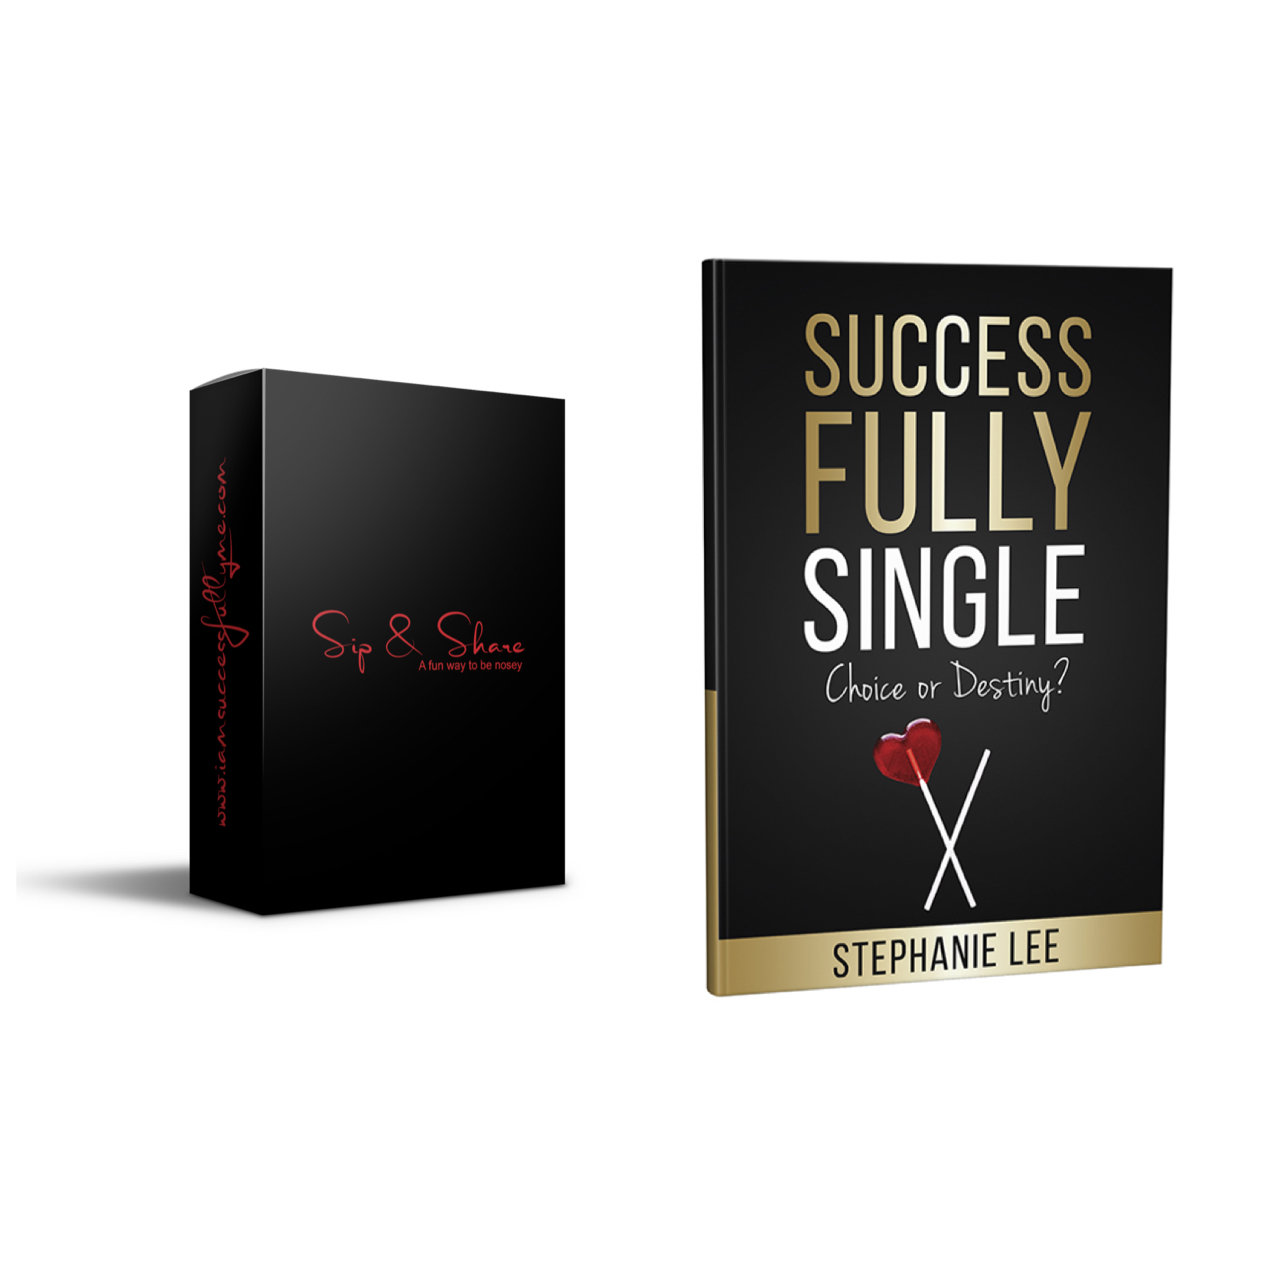 Sip & Share/Successfully Single Bundle! HUGE SAVINGS!